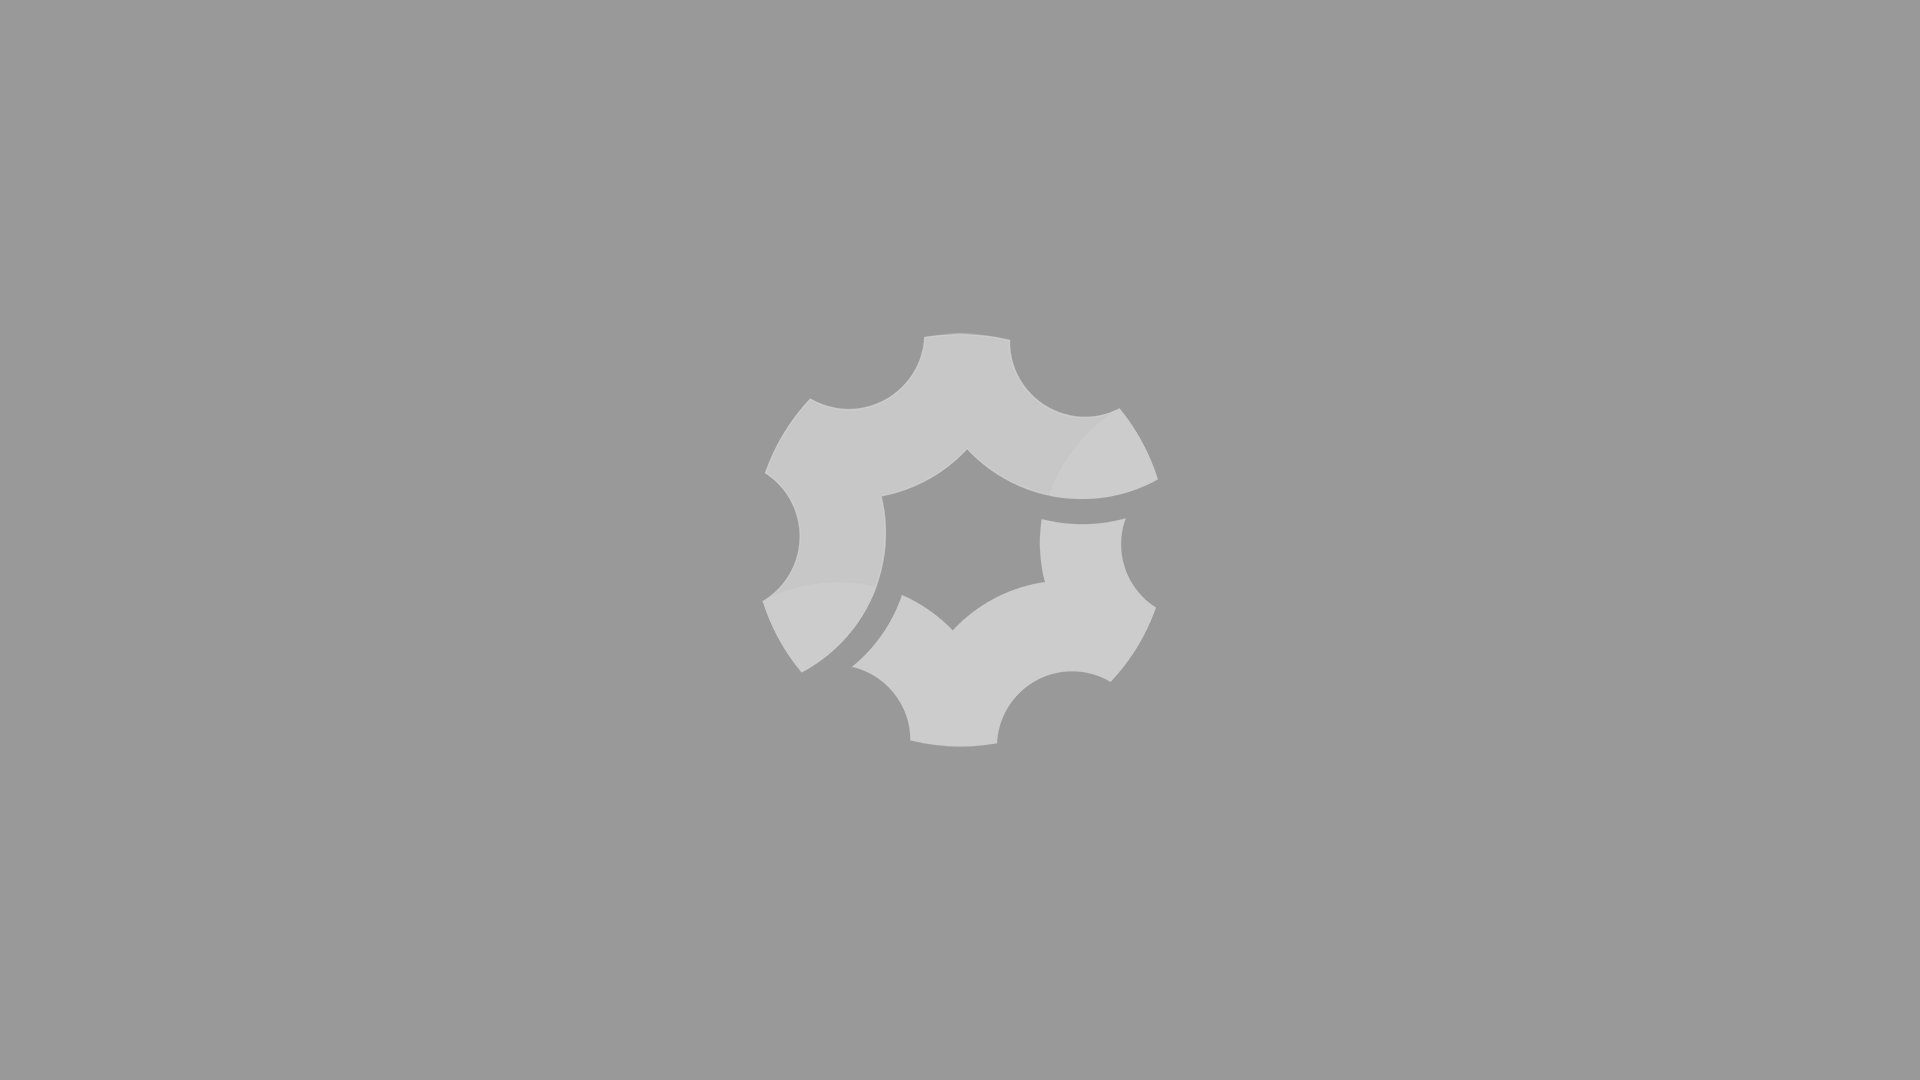 new_bitmap_image_2.bmp_thumbx.png